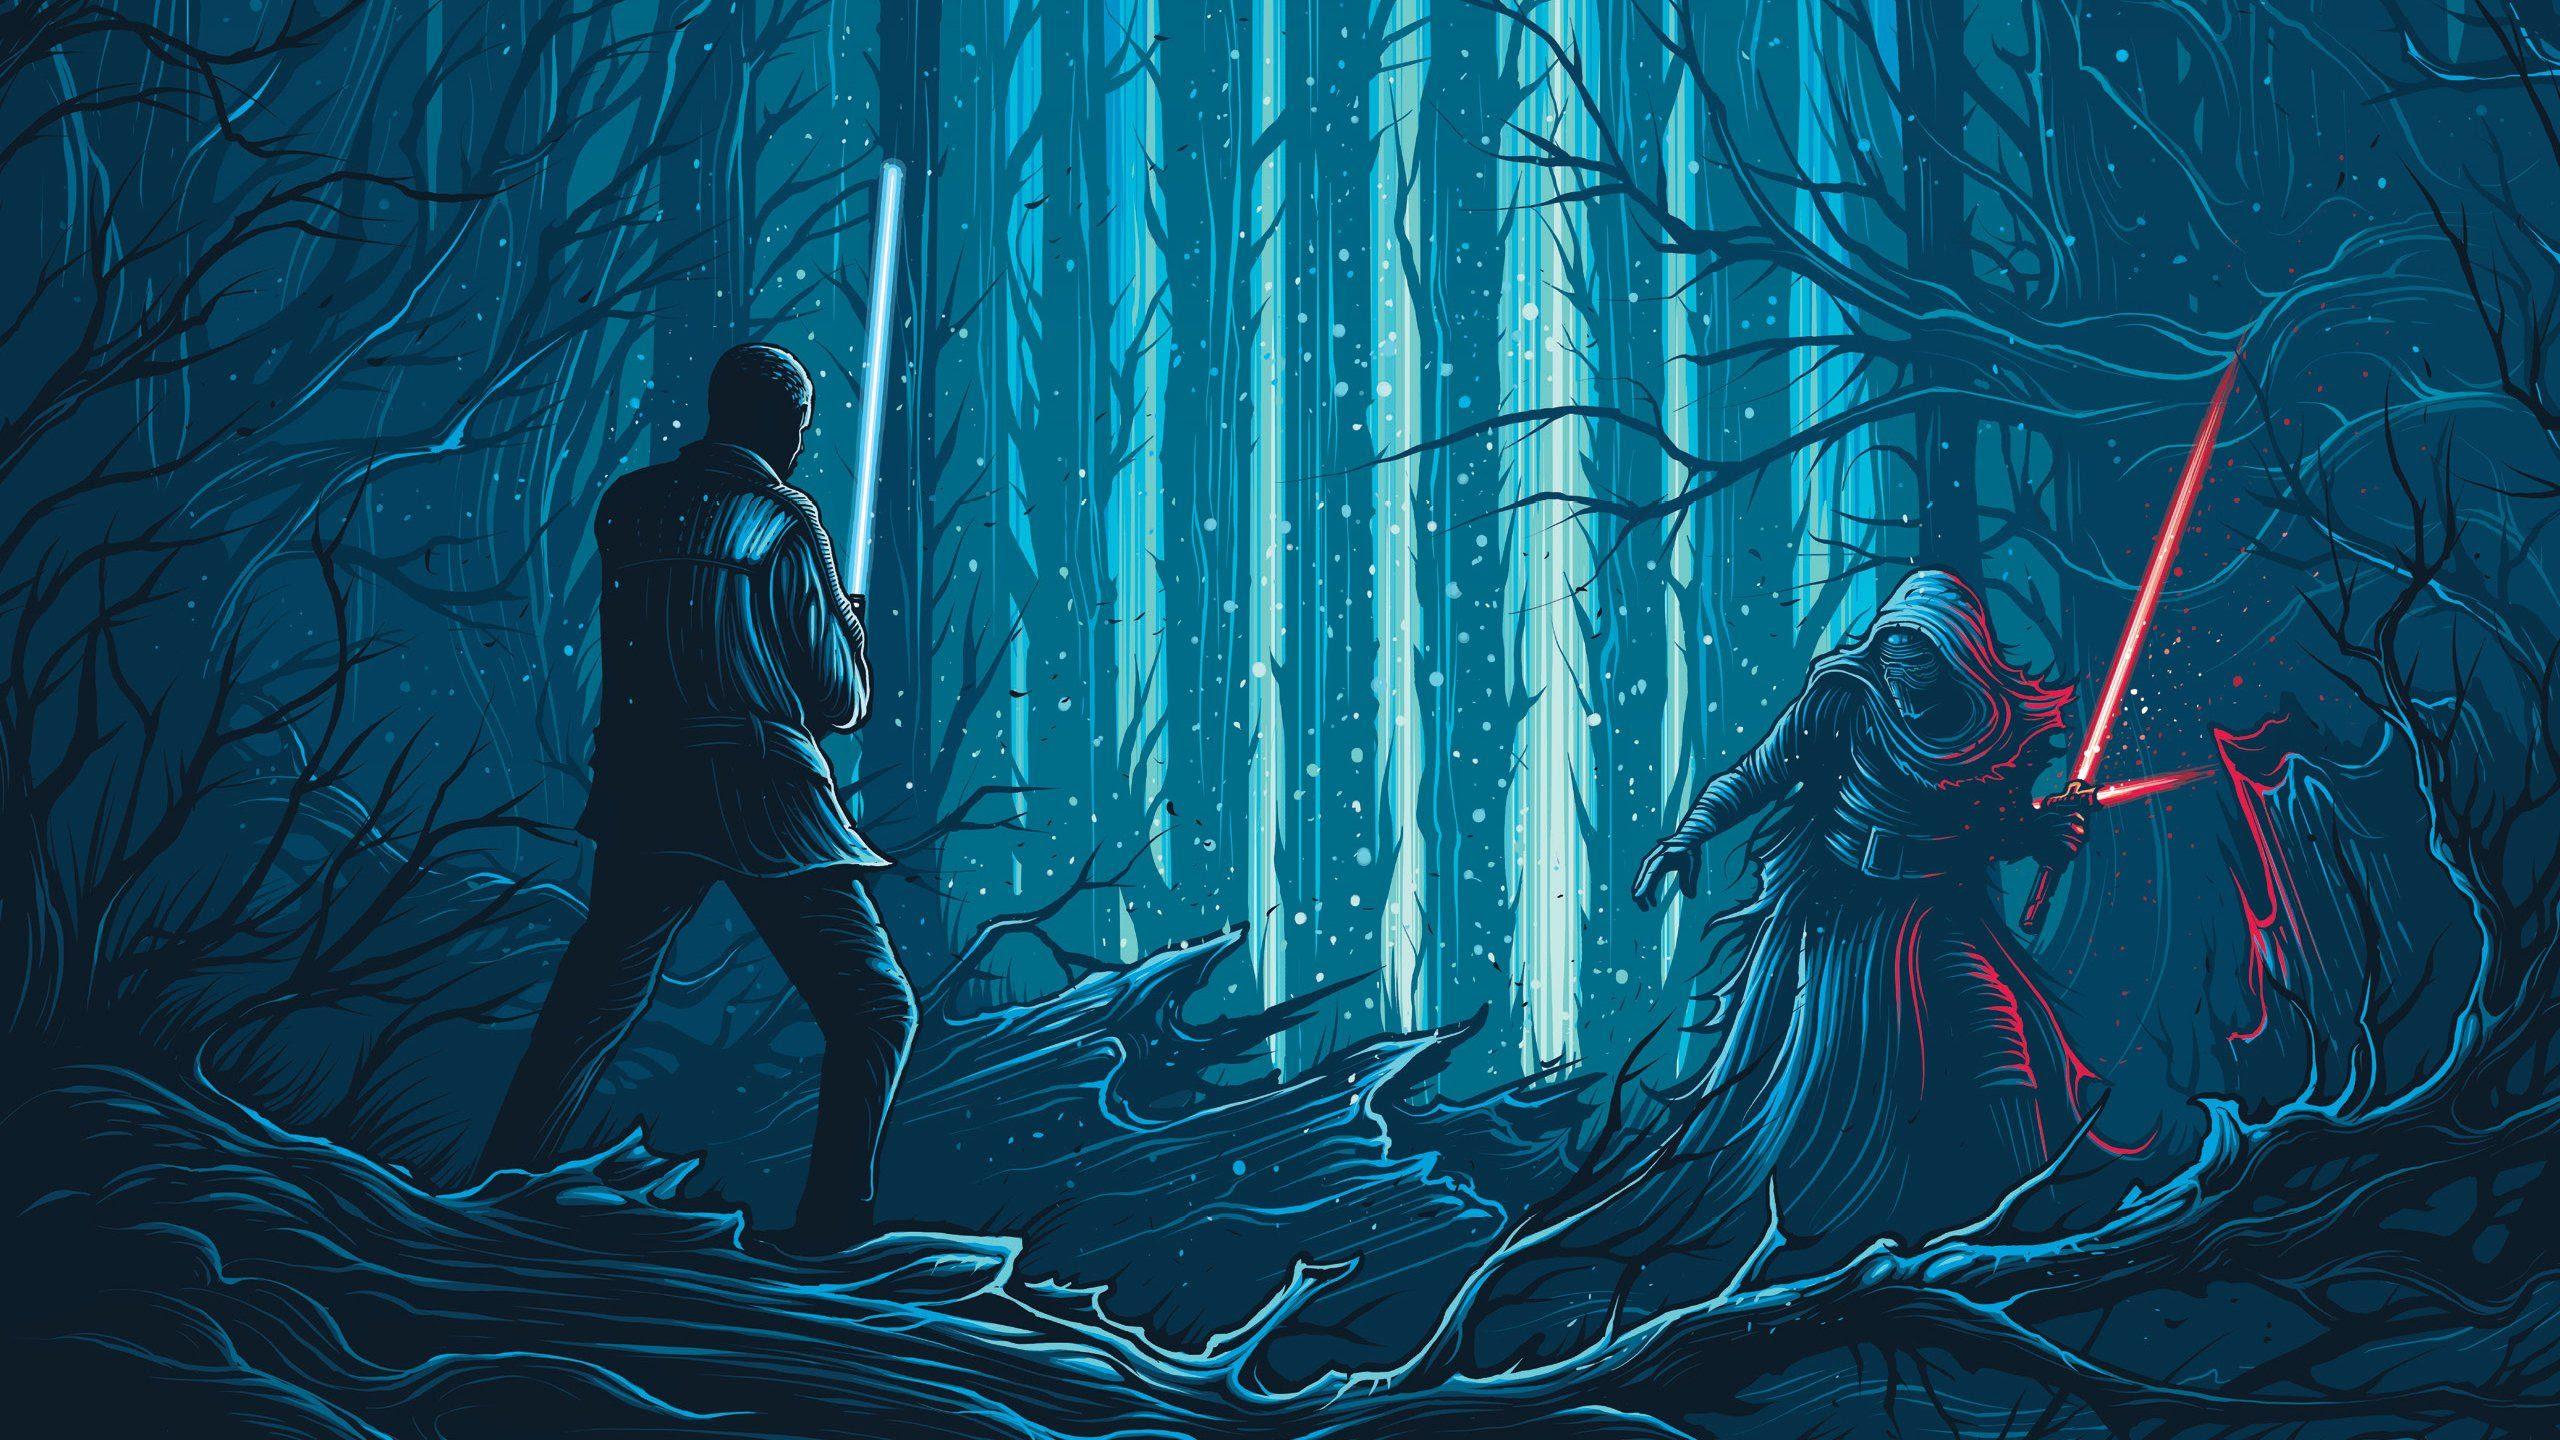 Star Wars Art Wallpaper Sf Wallpaper